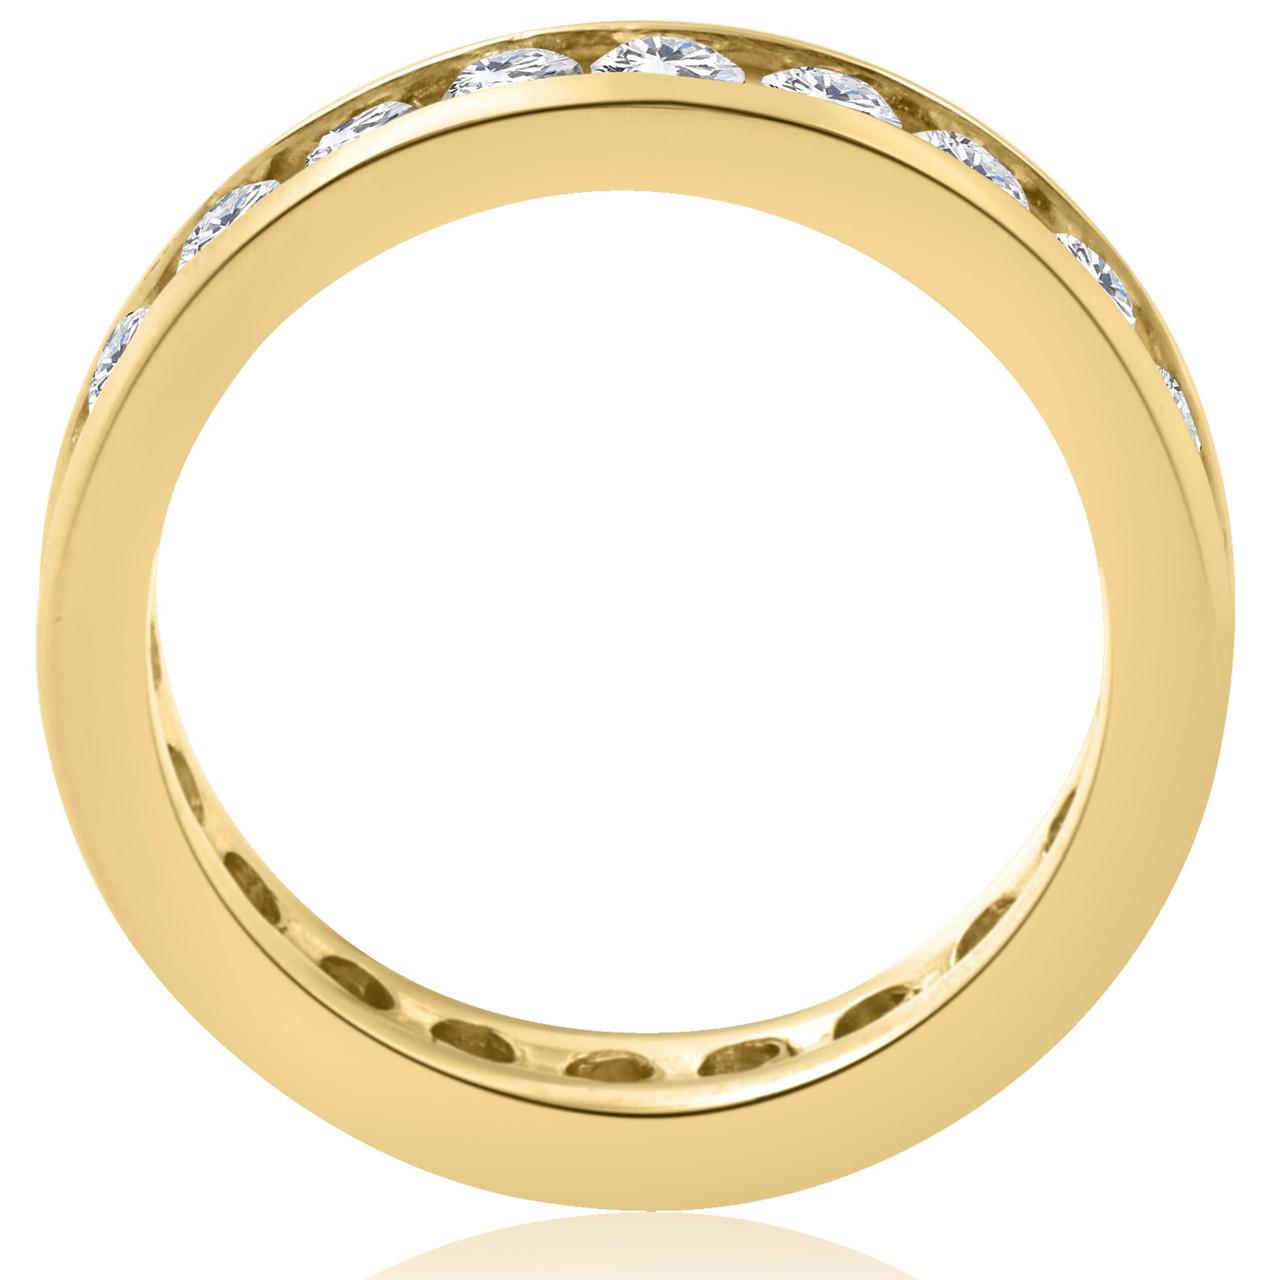 1ct Channel Set Diamond Eternity Ring 14K Yellow Gold